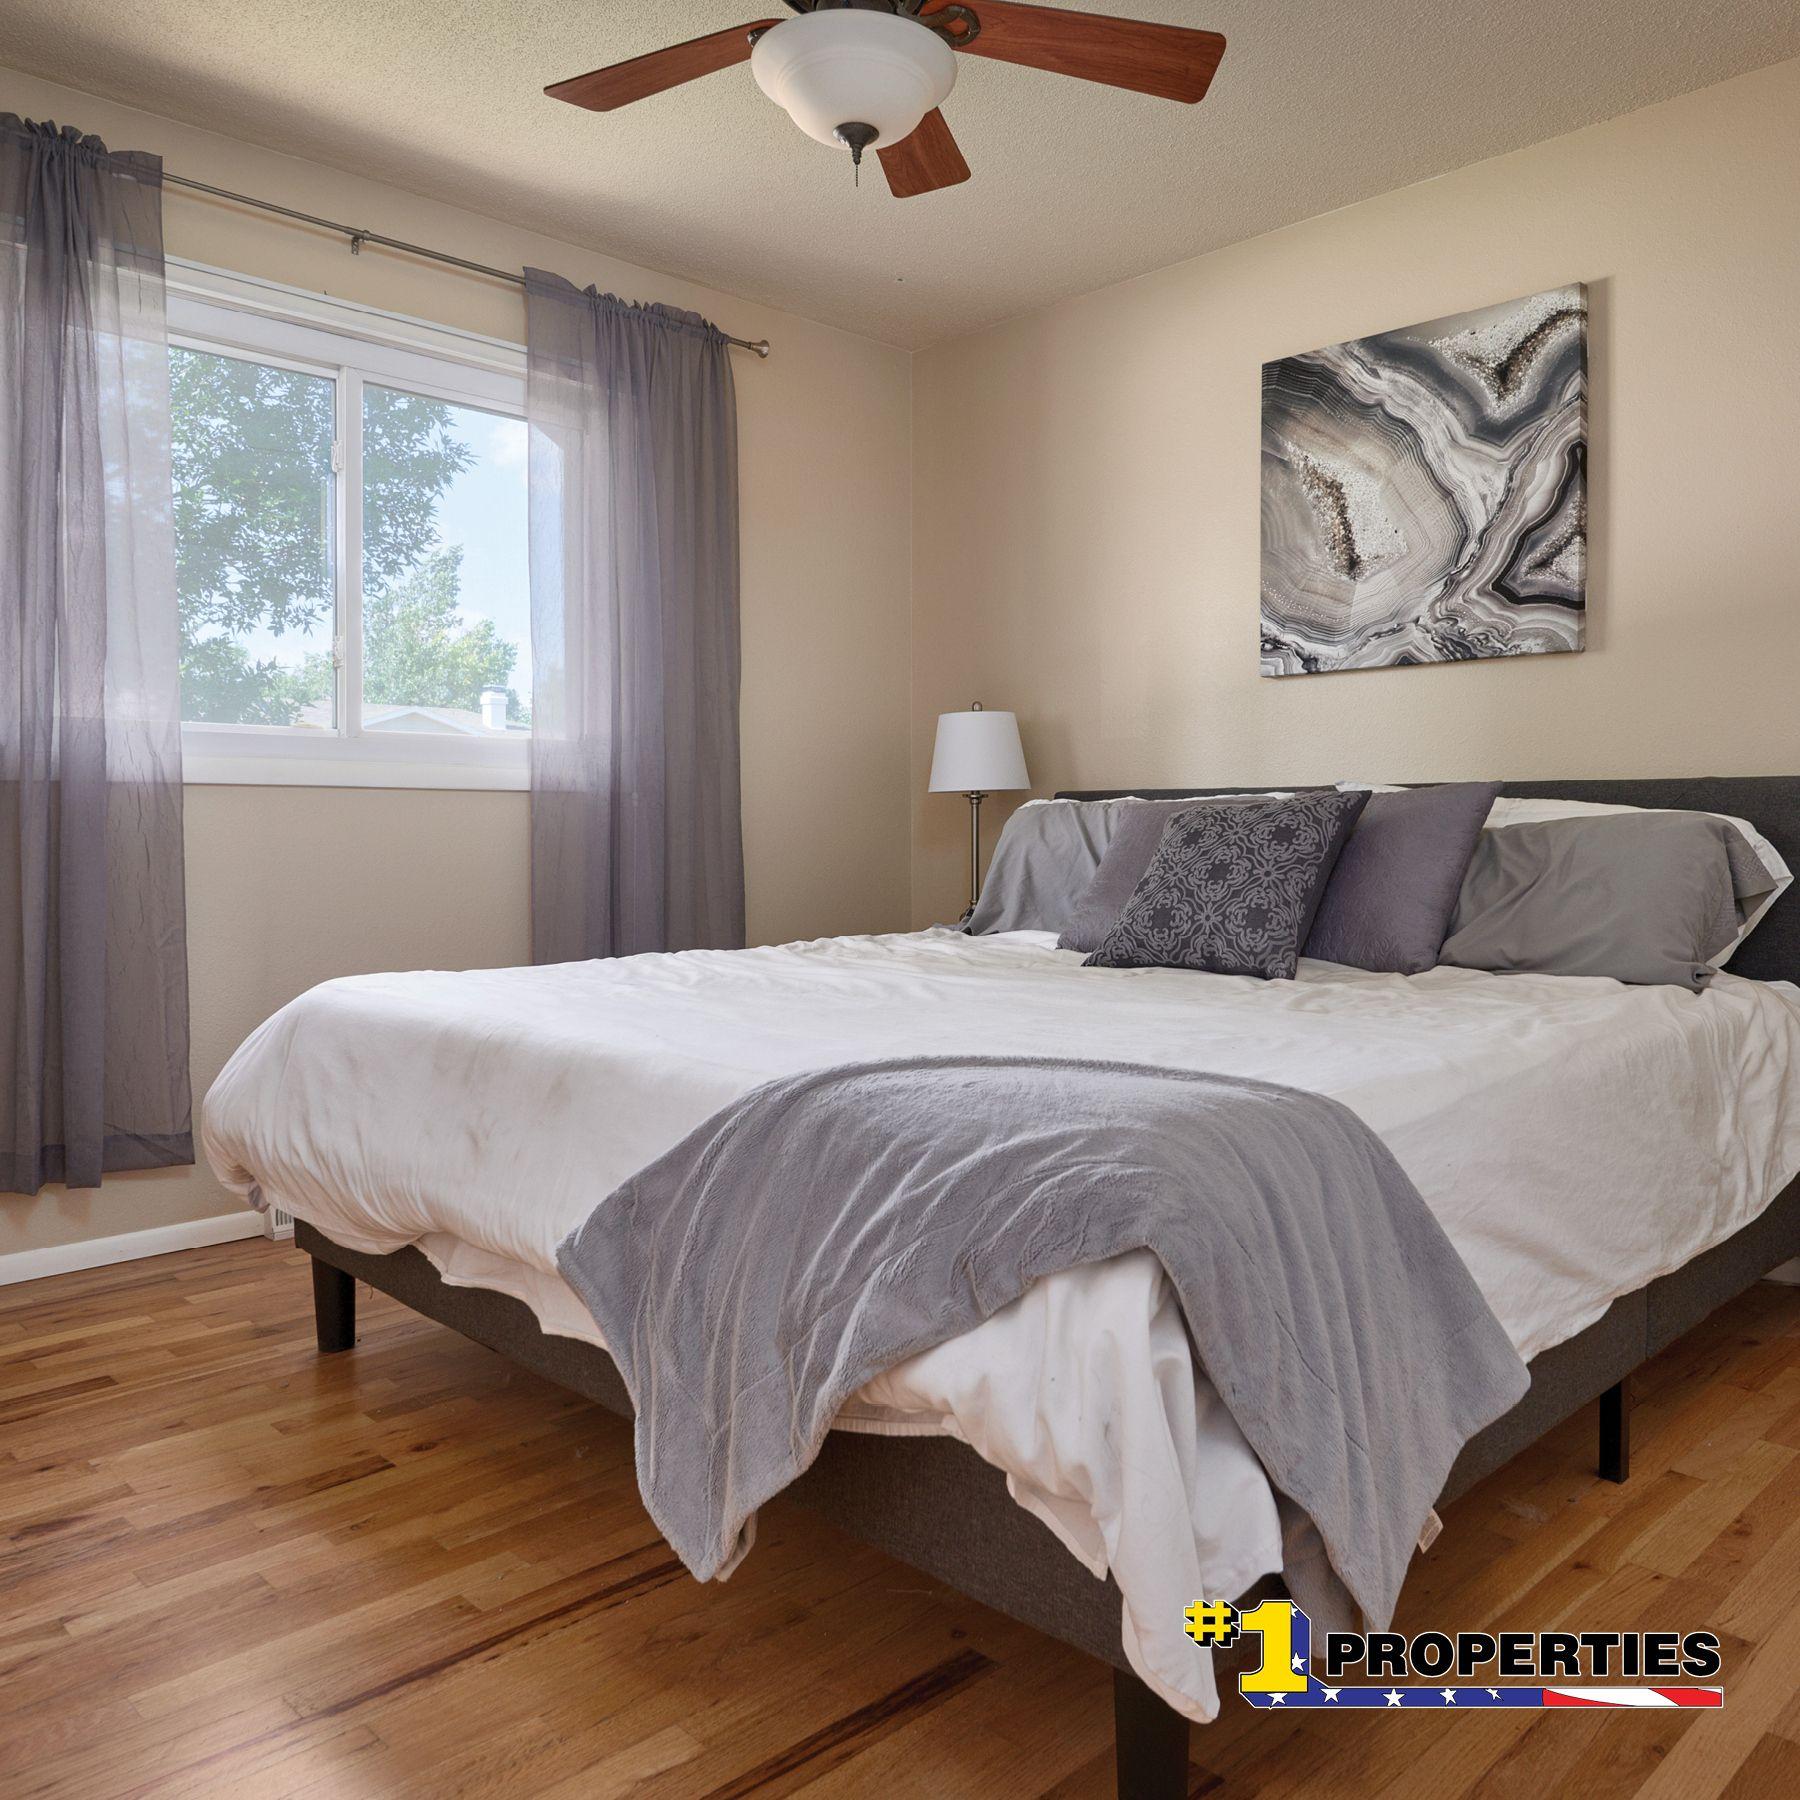 Hardwood Floors For The Win Openhousethursday 7005 Manhattan Lane Cheyenne Wyoming Cheyennehomes Realestate Househunting Bedroom Design Home Decor Home